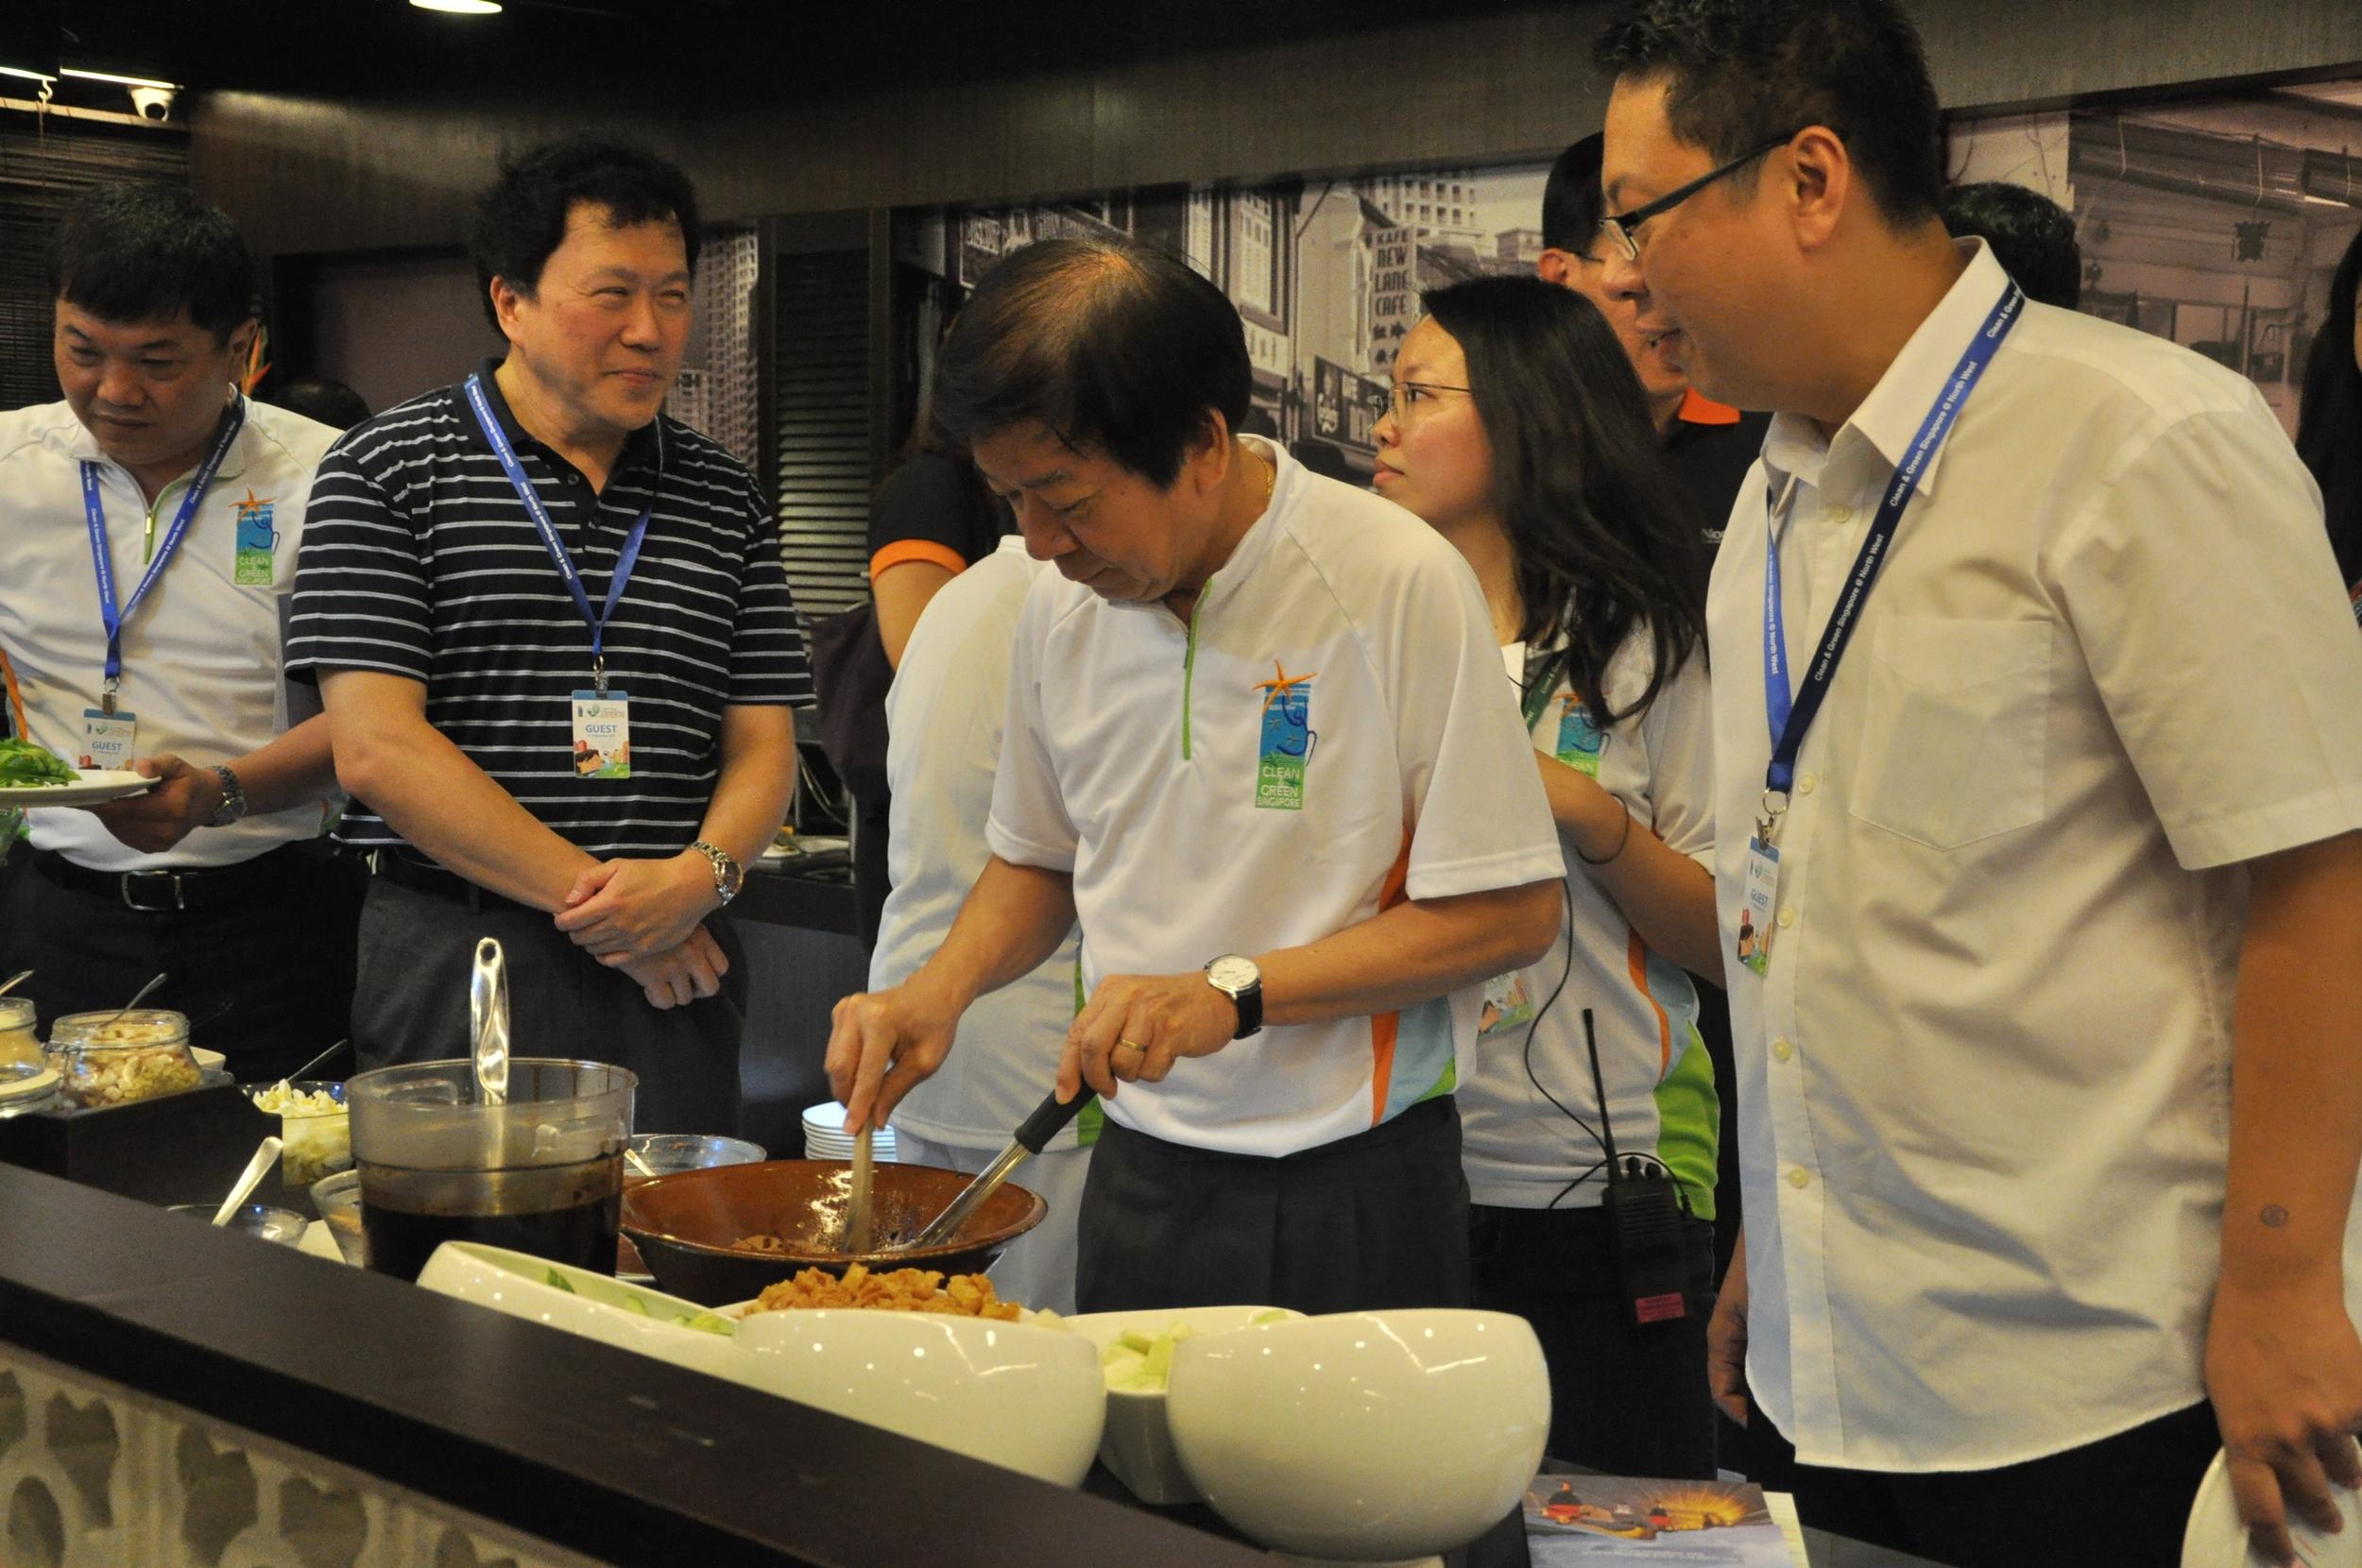 Minister Khaw Boon Wan making his own Penang Rojak at Penang St Buffet (Causeway Point)